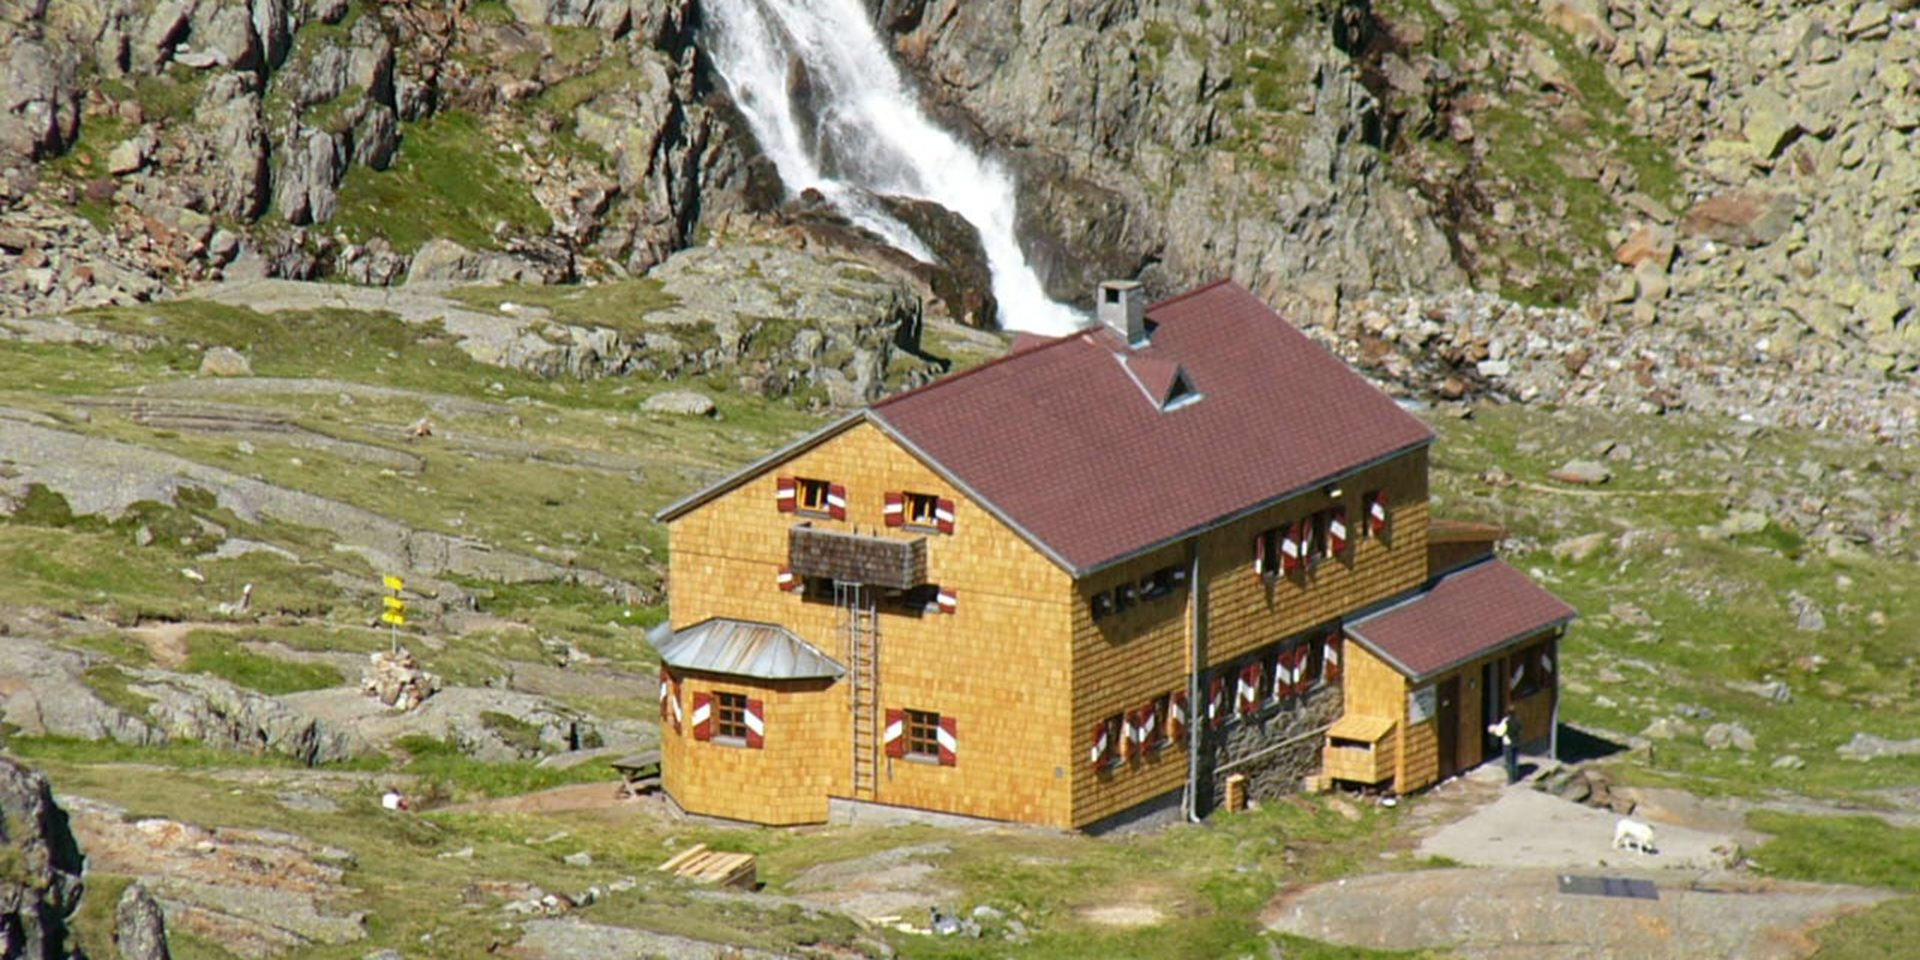 Wiener Höhenweg Elberfelder Hütte